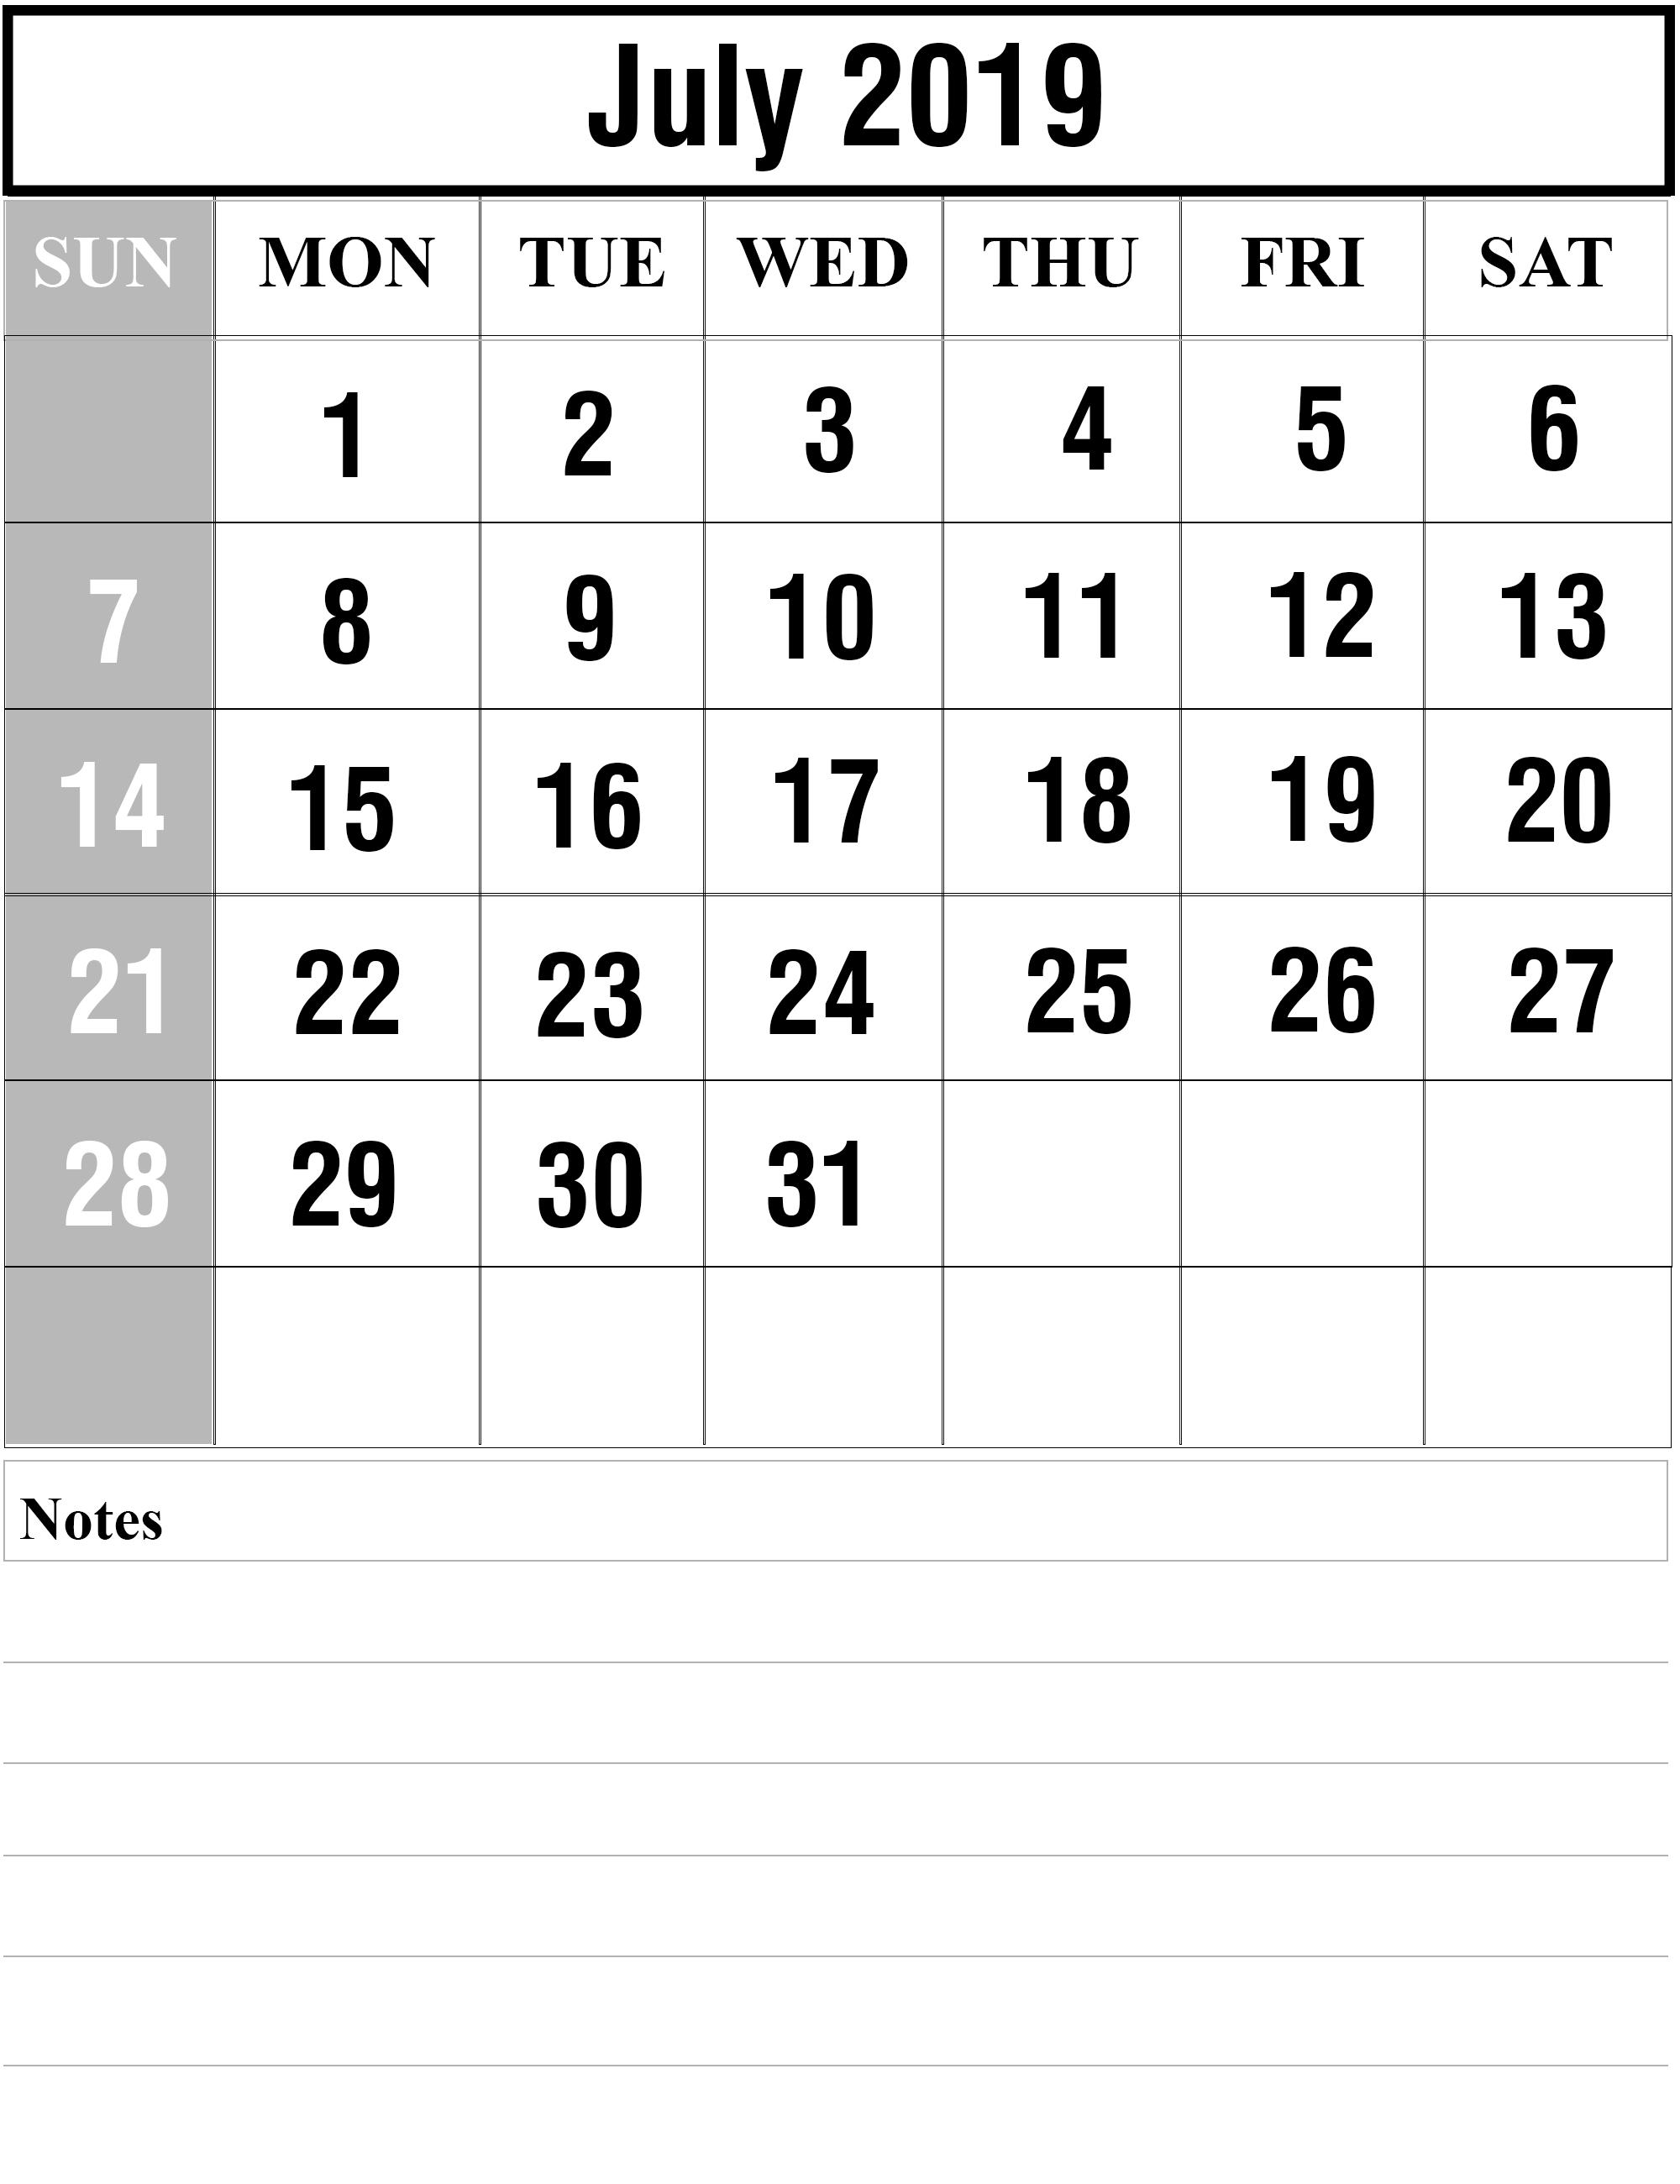 July 2019 Printable Calendar To Do List